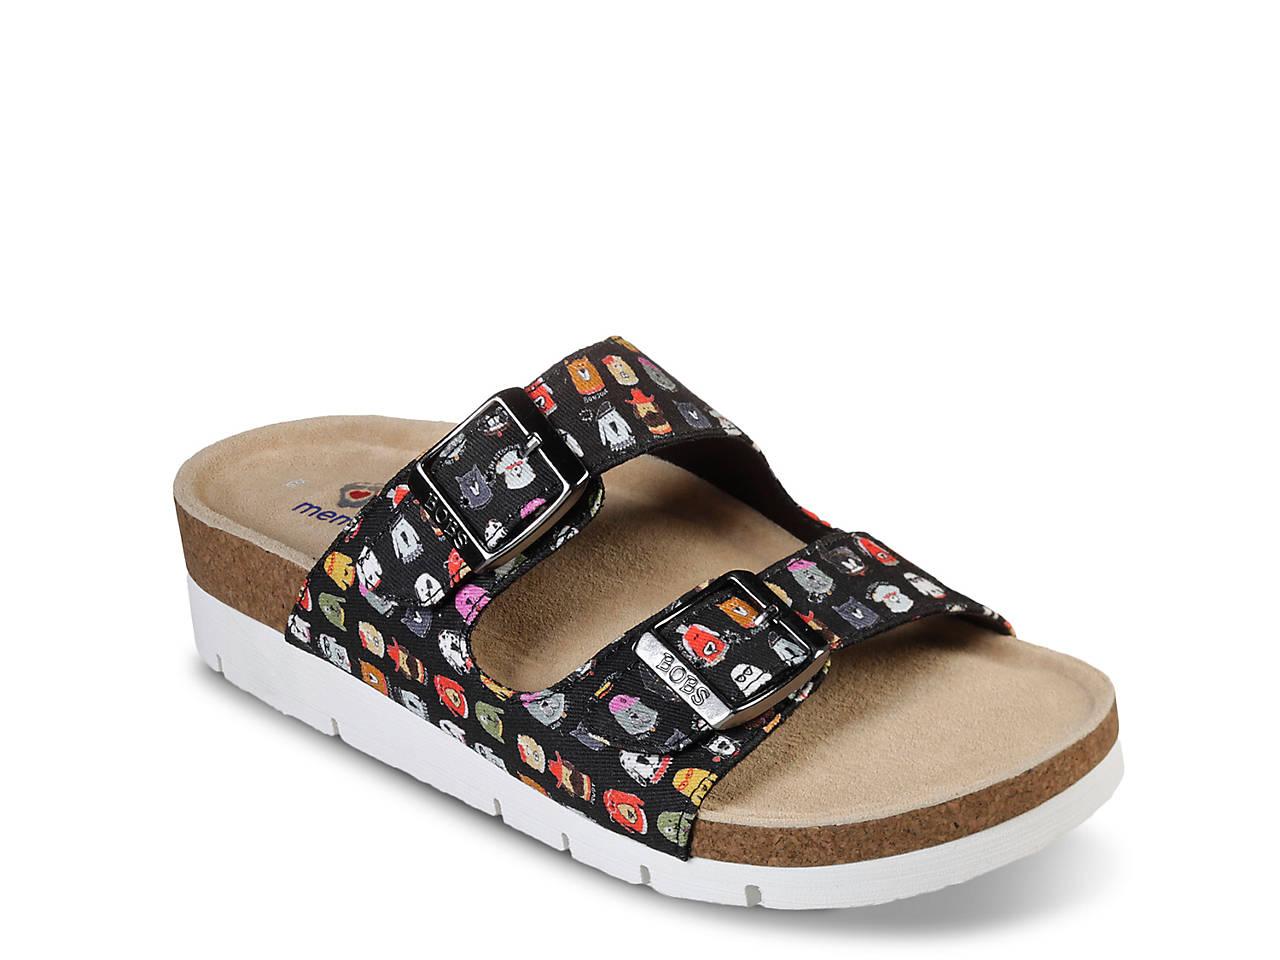 5a65f4e75e0f1 Skechers BOBS Bohemian Tails Away Sandal Women's Shoes | DSW